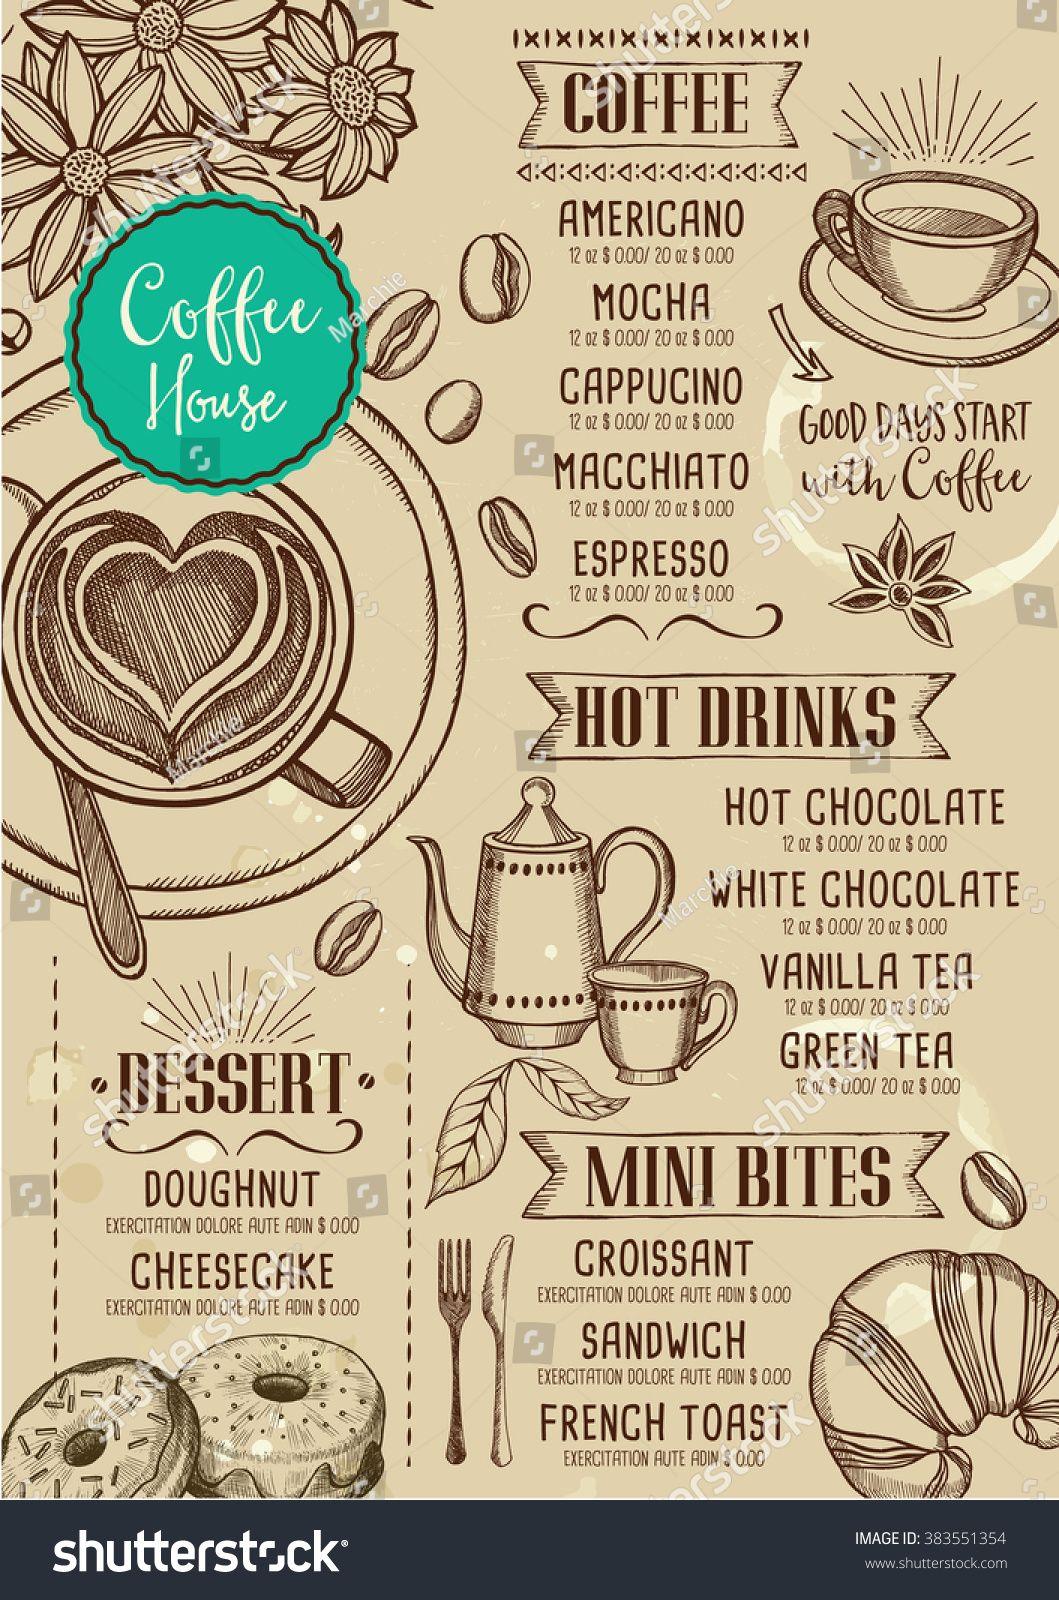 Pin by Maria Ballotti on menu   Pinterest   Coffee restaurants ...